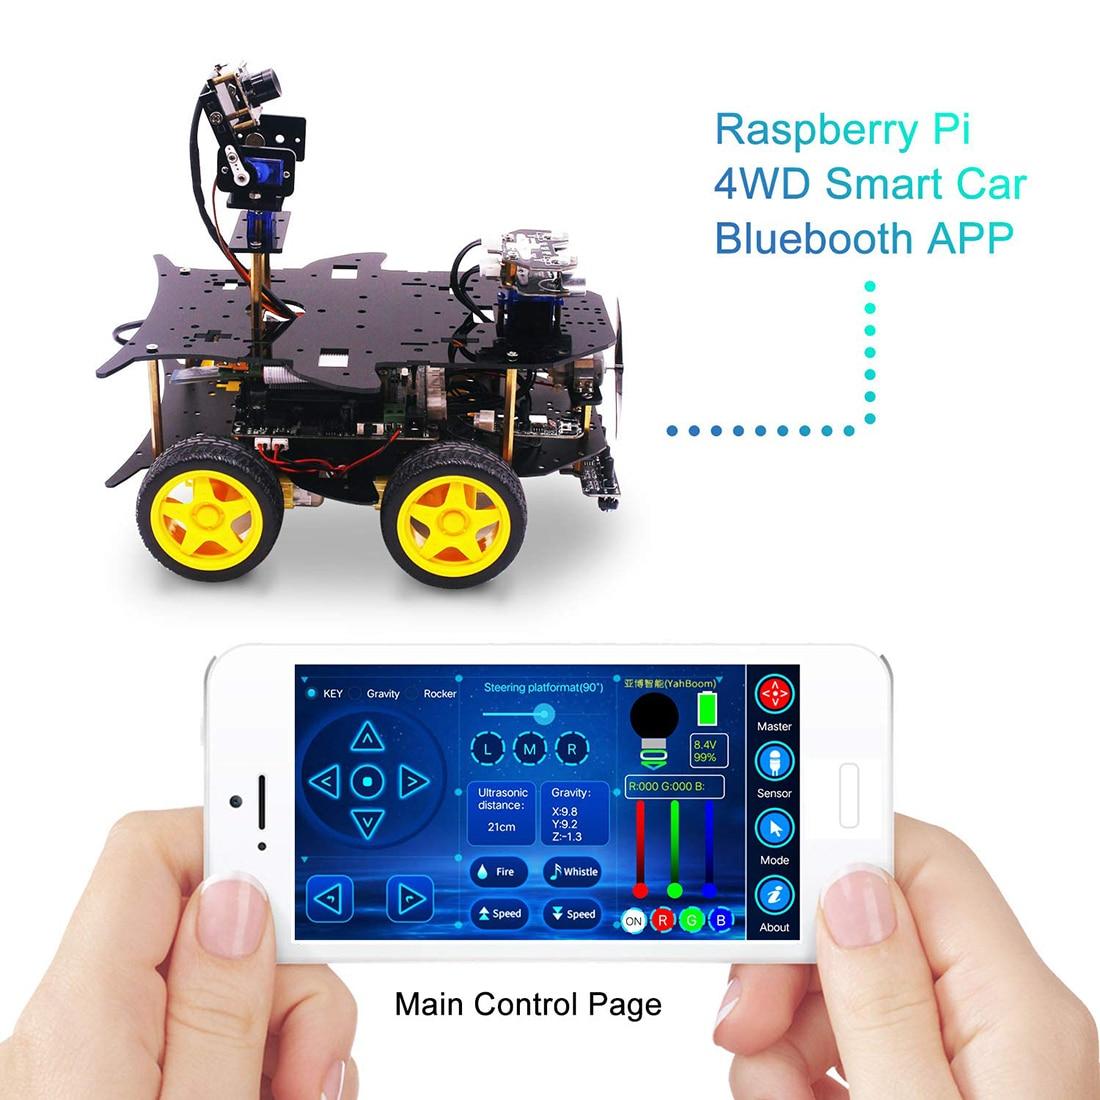 Ultimate Starter Kit voor Raspberry Pi 3 B + HD Camera Programmeerbare Smart Robot Car Kit met 4WD Elektronica Onderwijs-in Professioneel Speelgoed van Speelgoed & Hobbies op  Groep 2